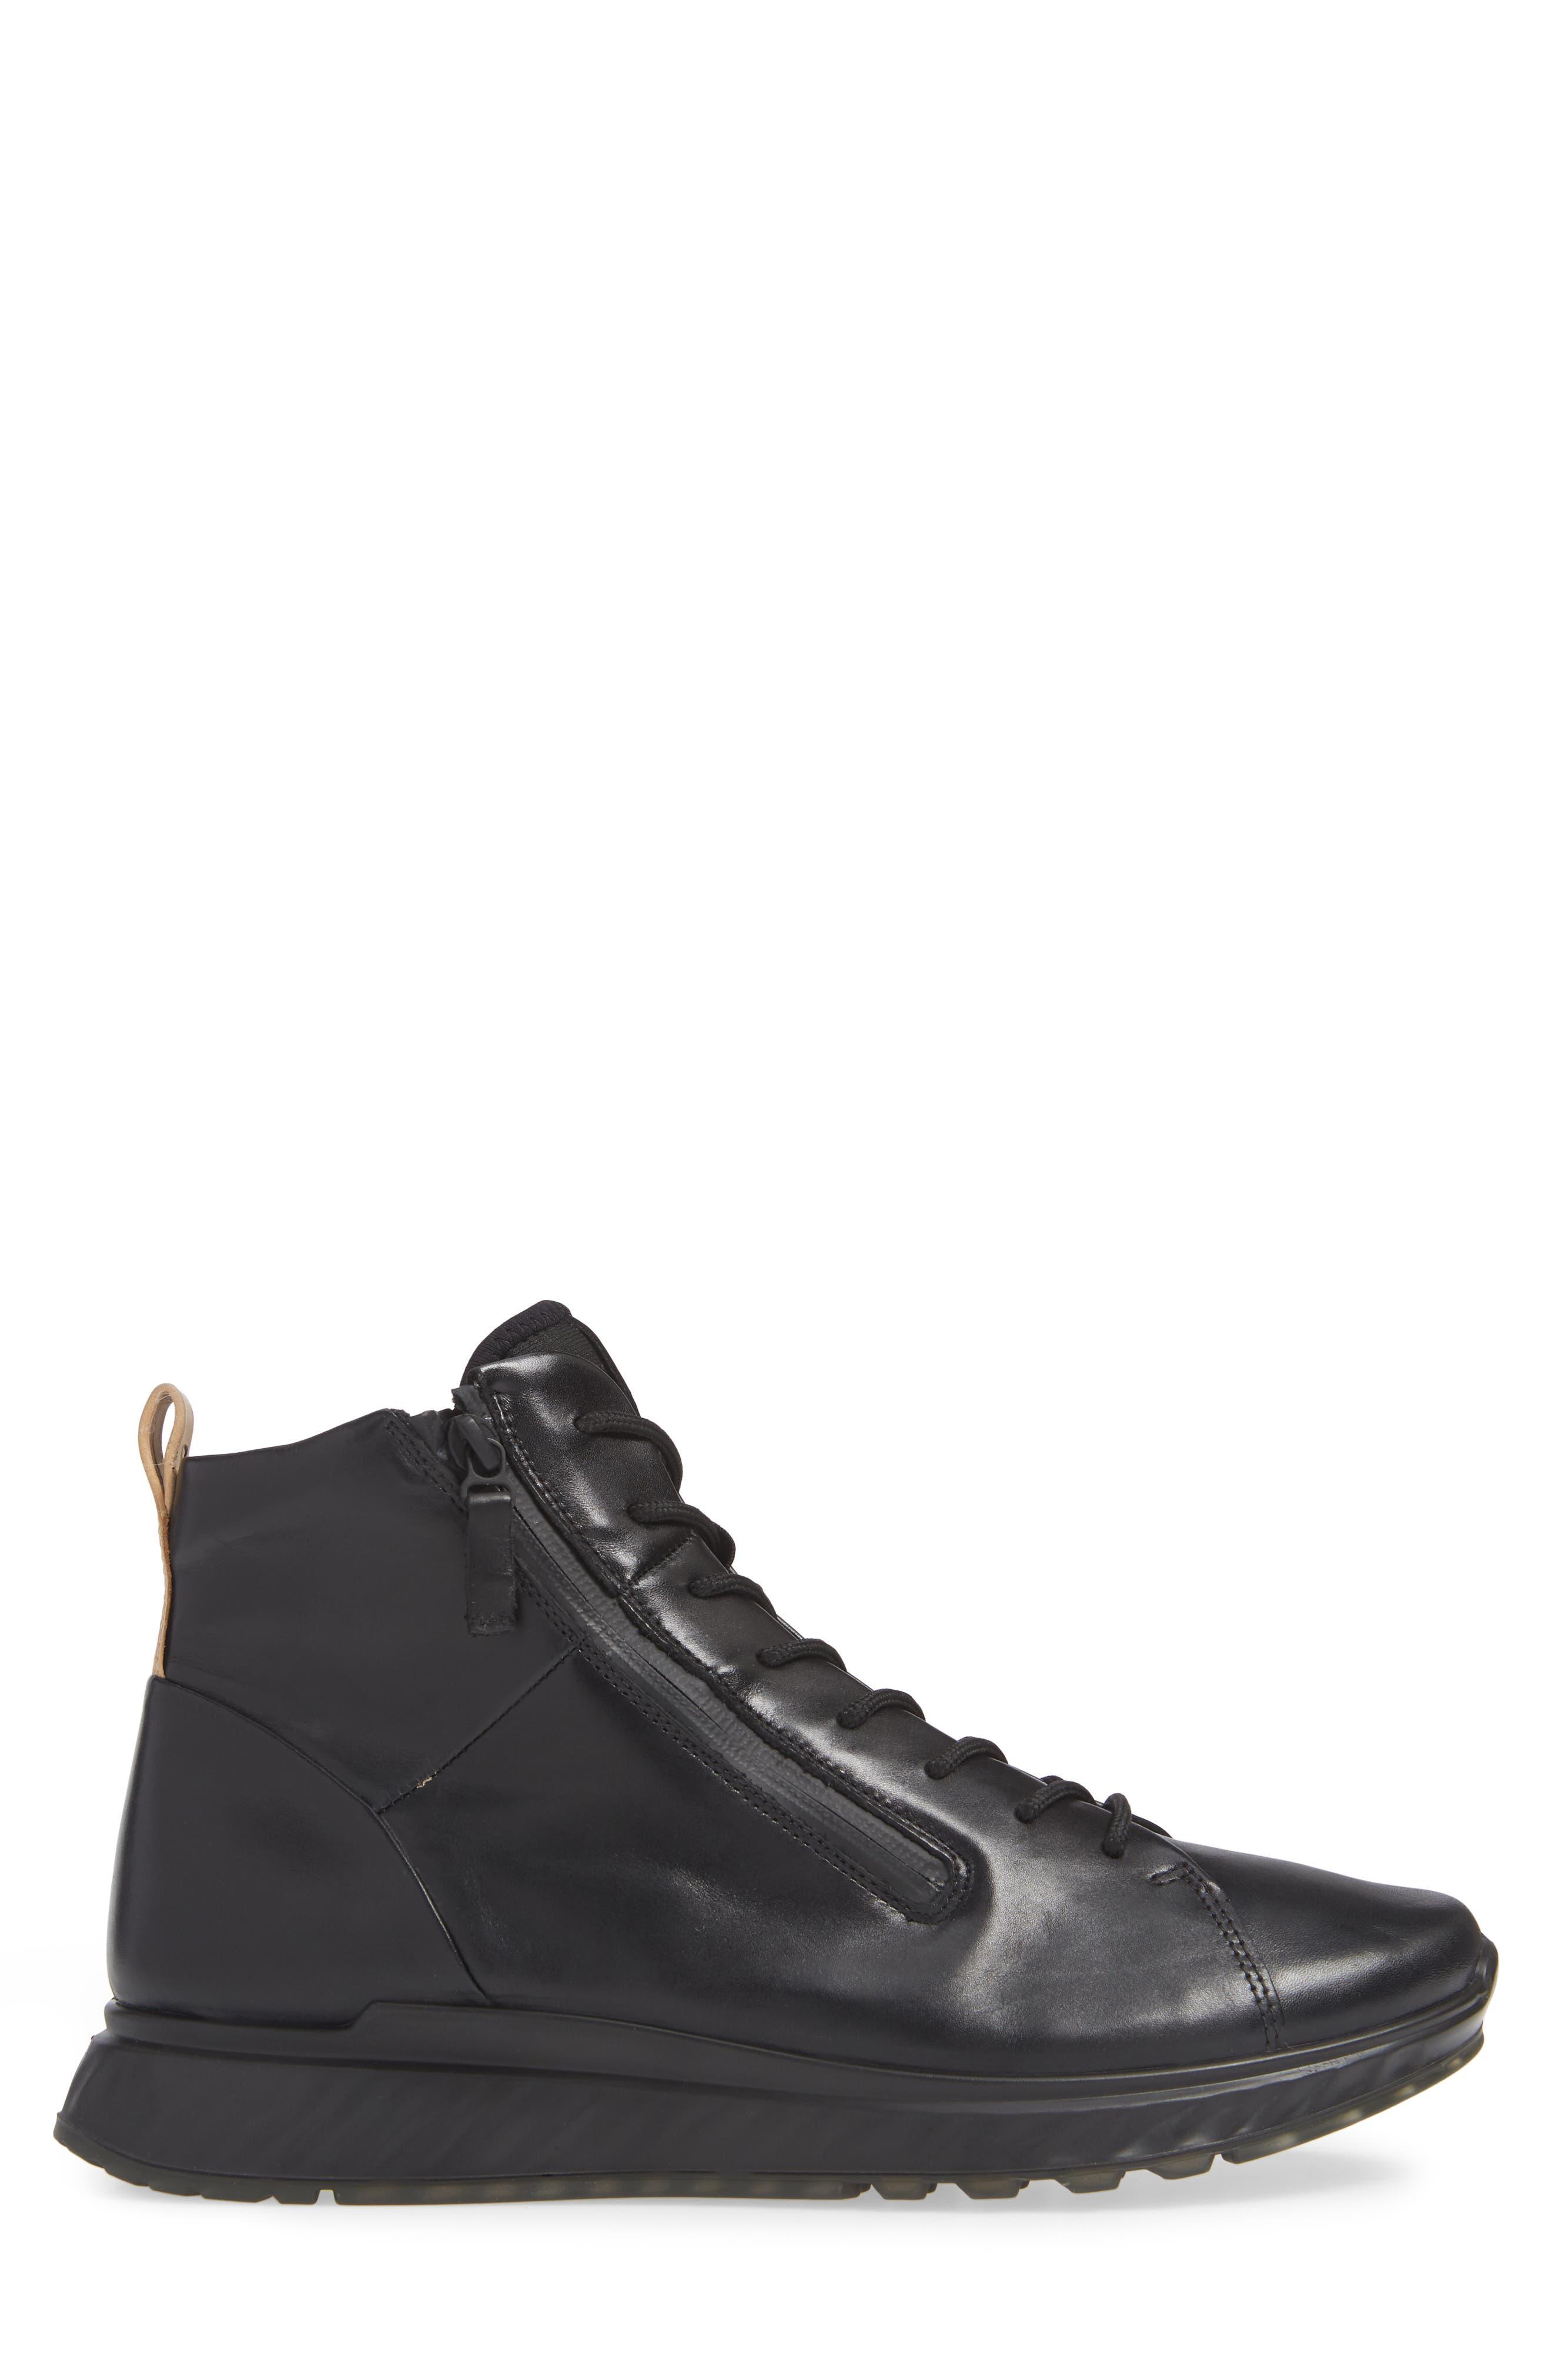 ST1 High Top Sneaker,                             Alternate thumbnail 3, color,                             BLACK/BLACK LEATHER